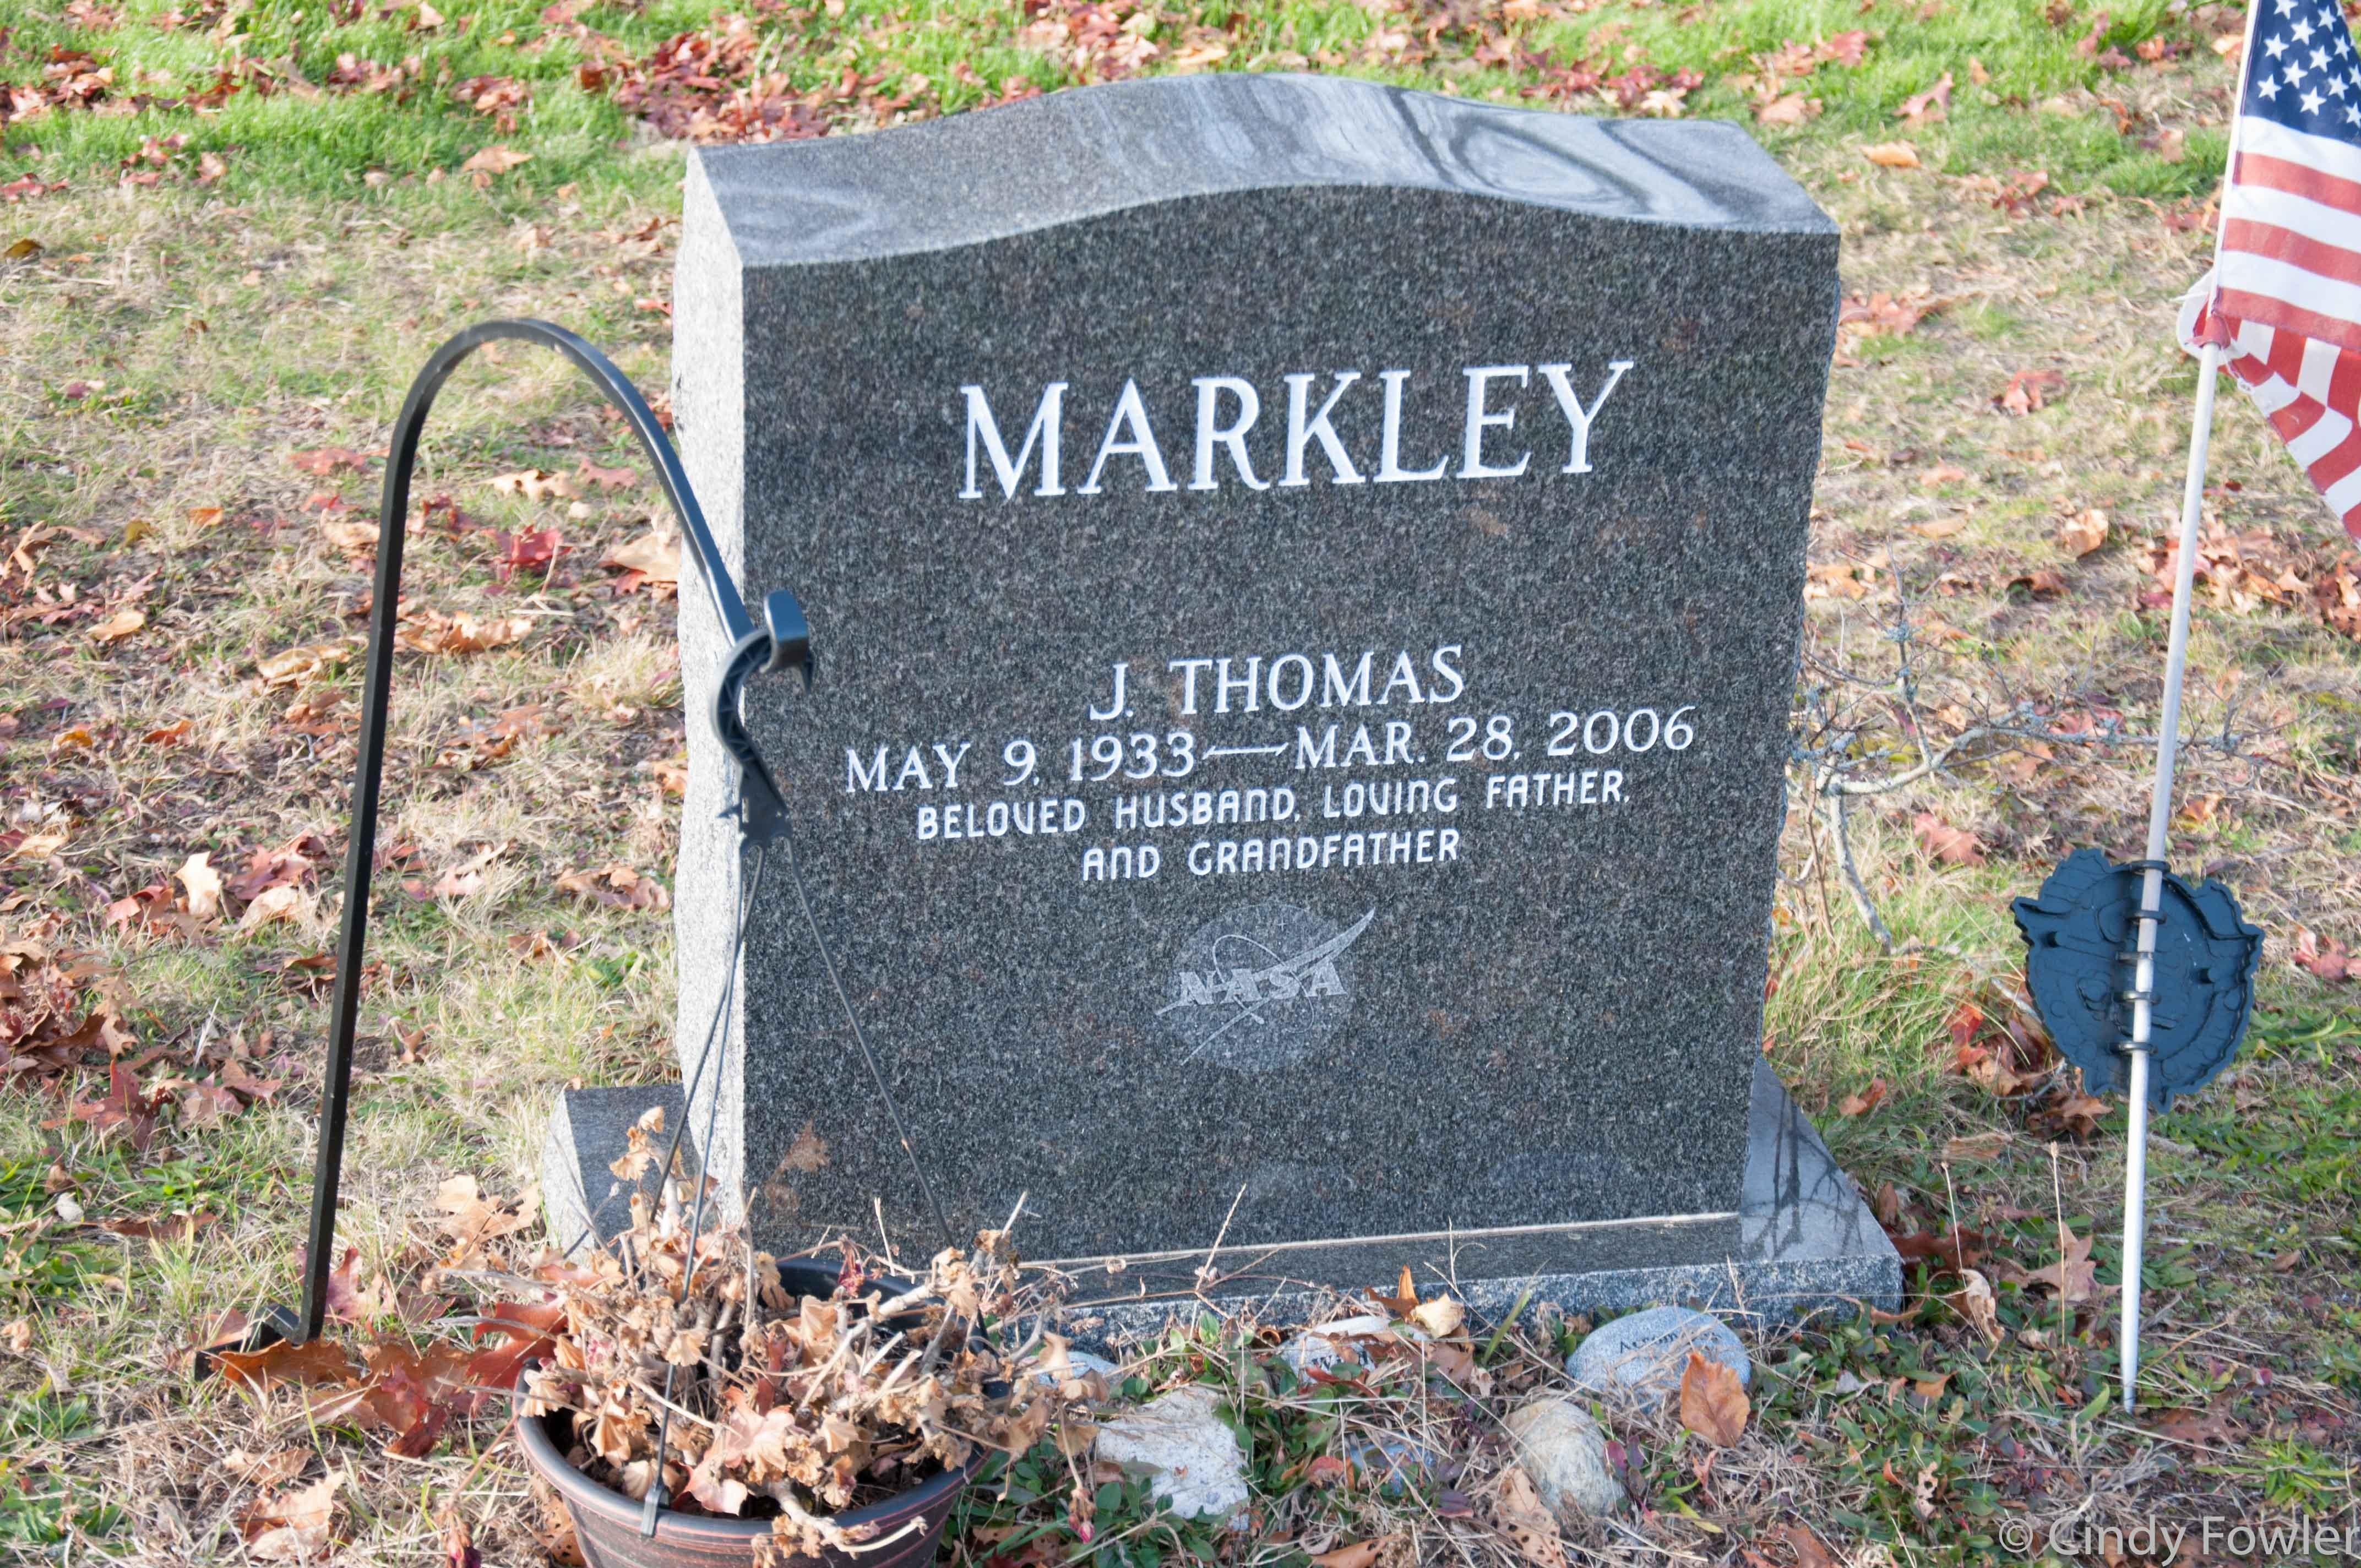 J. Thomas Markley